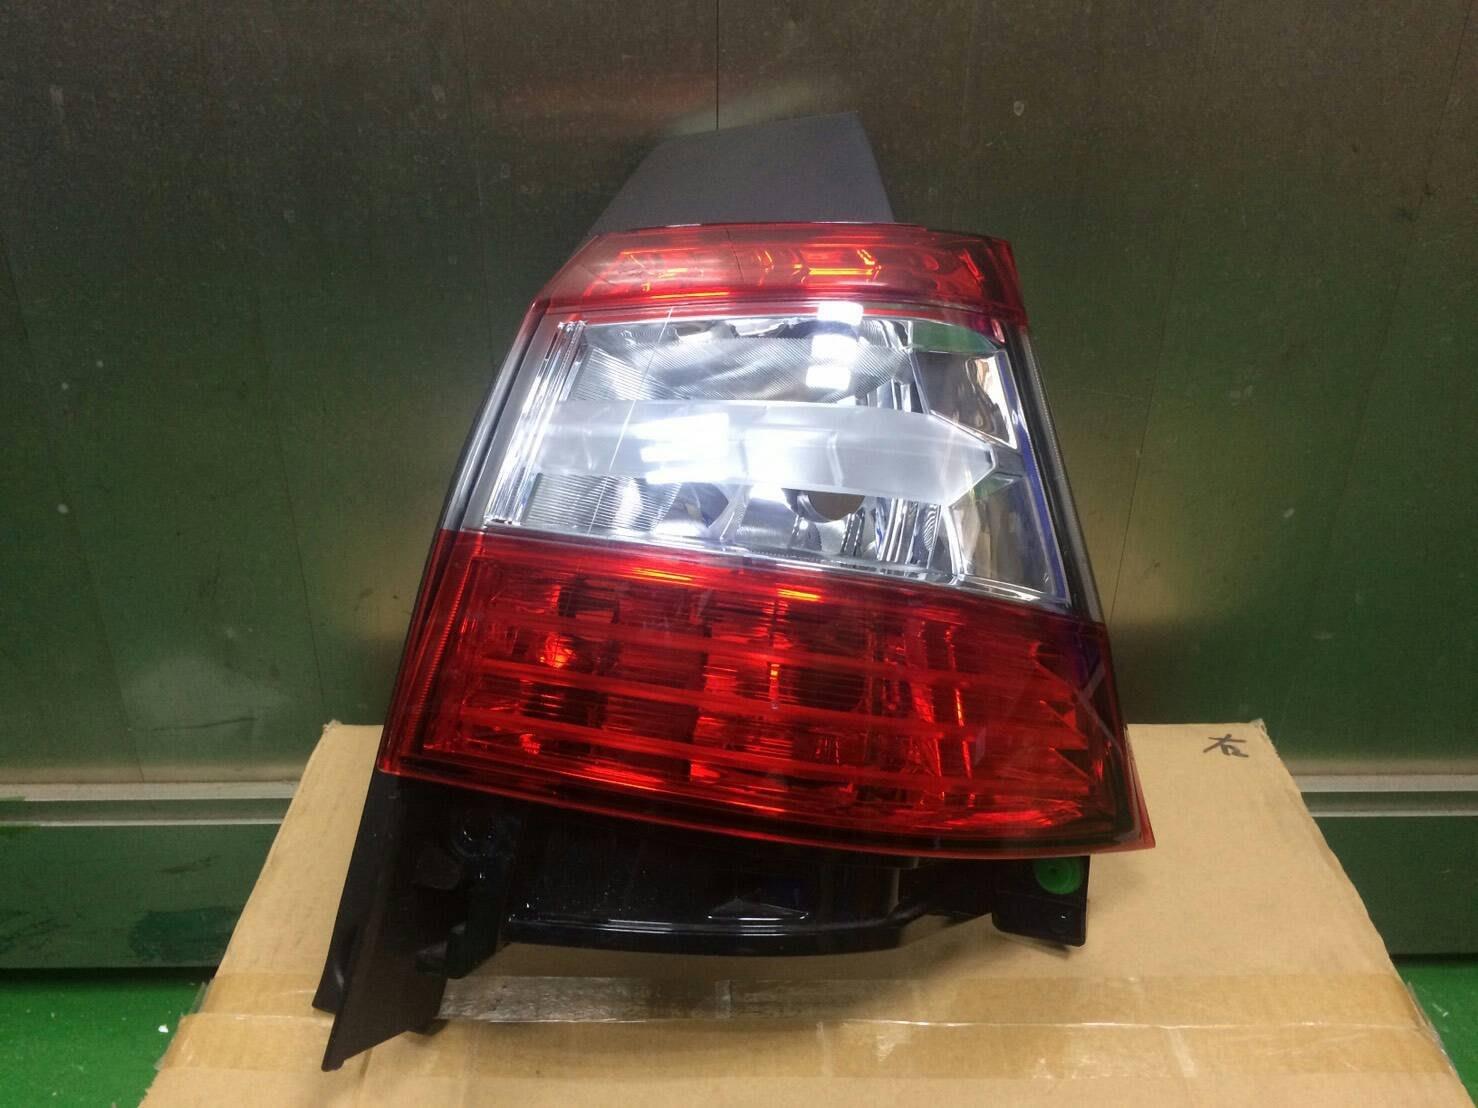 NISSAN全車系 L11後燈R(外)T32 Z51 A34 TIIDA C12 CE VERITA B17 HS